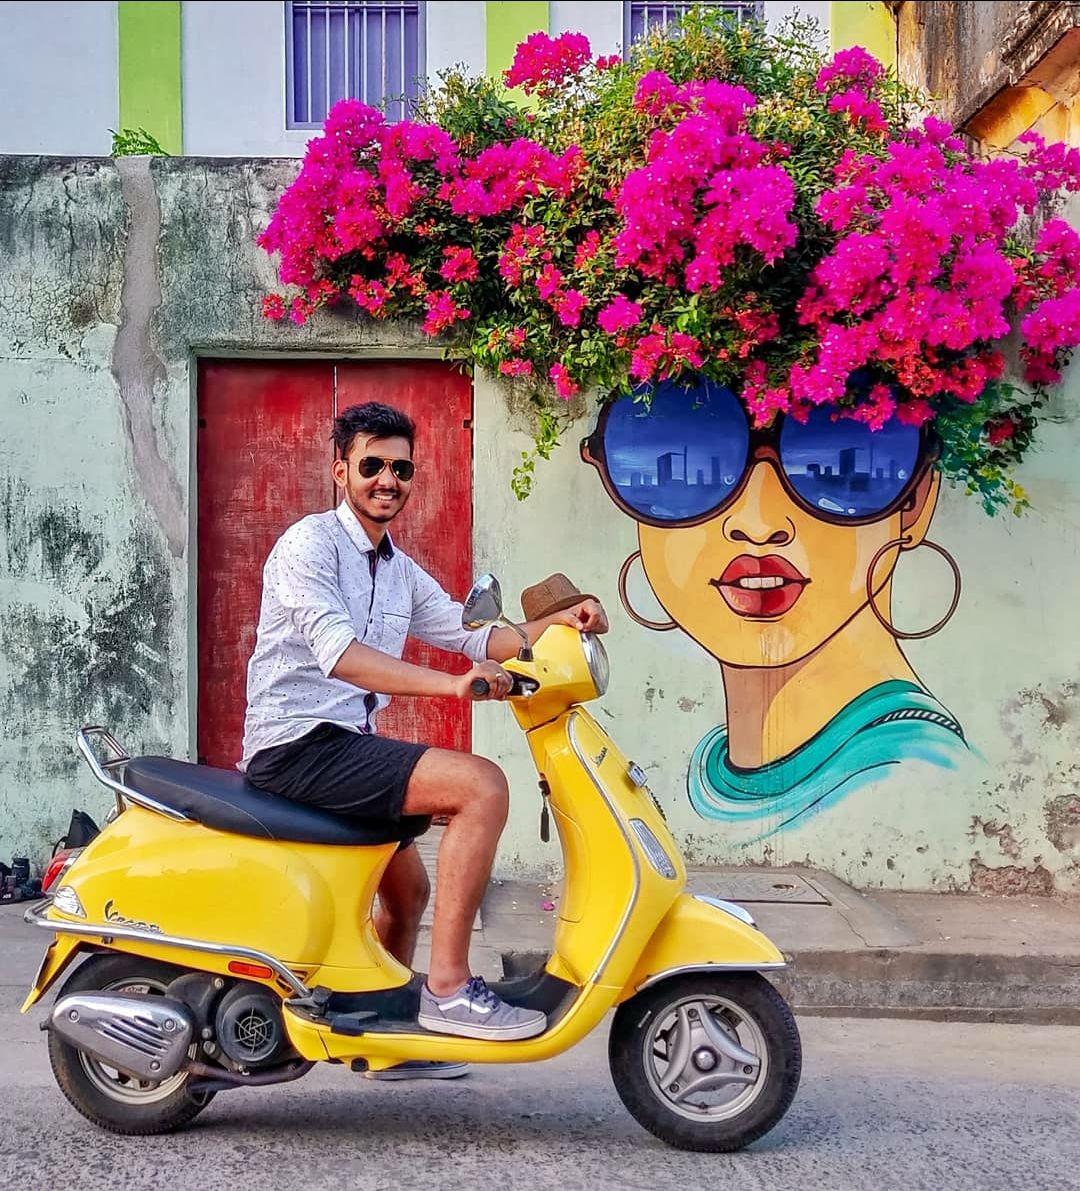 Photo of Pondicherry By sanjay kumar behera